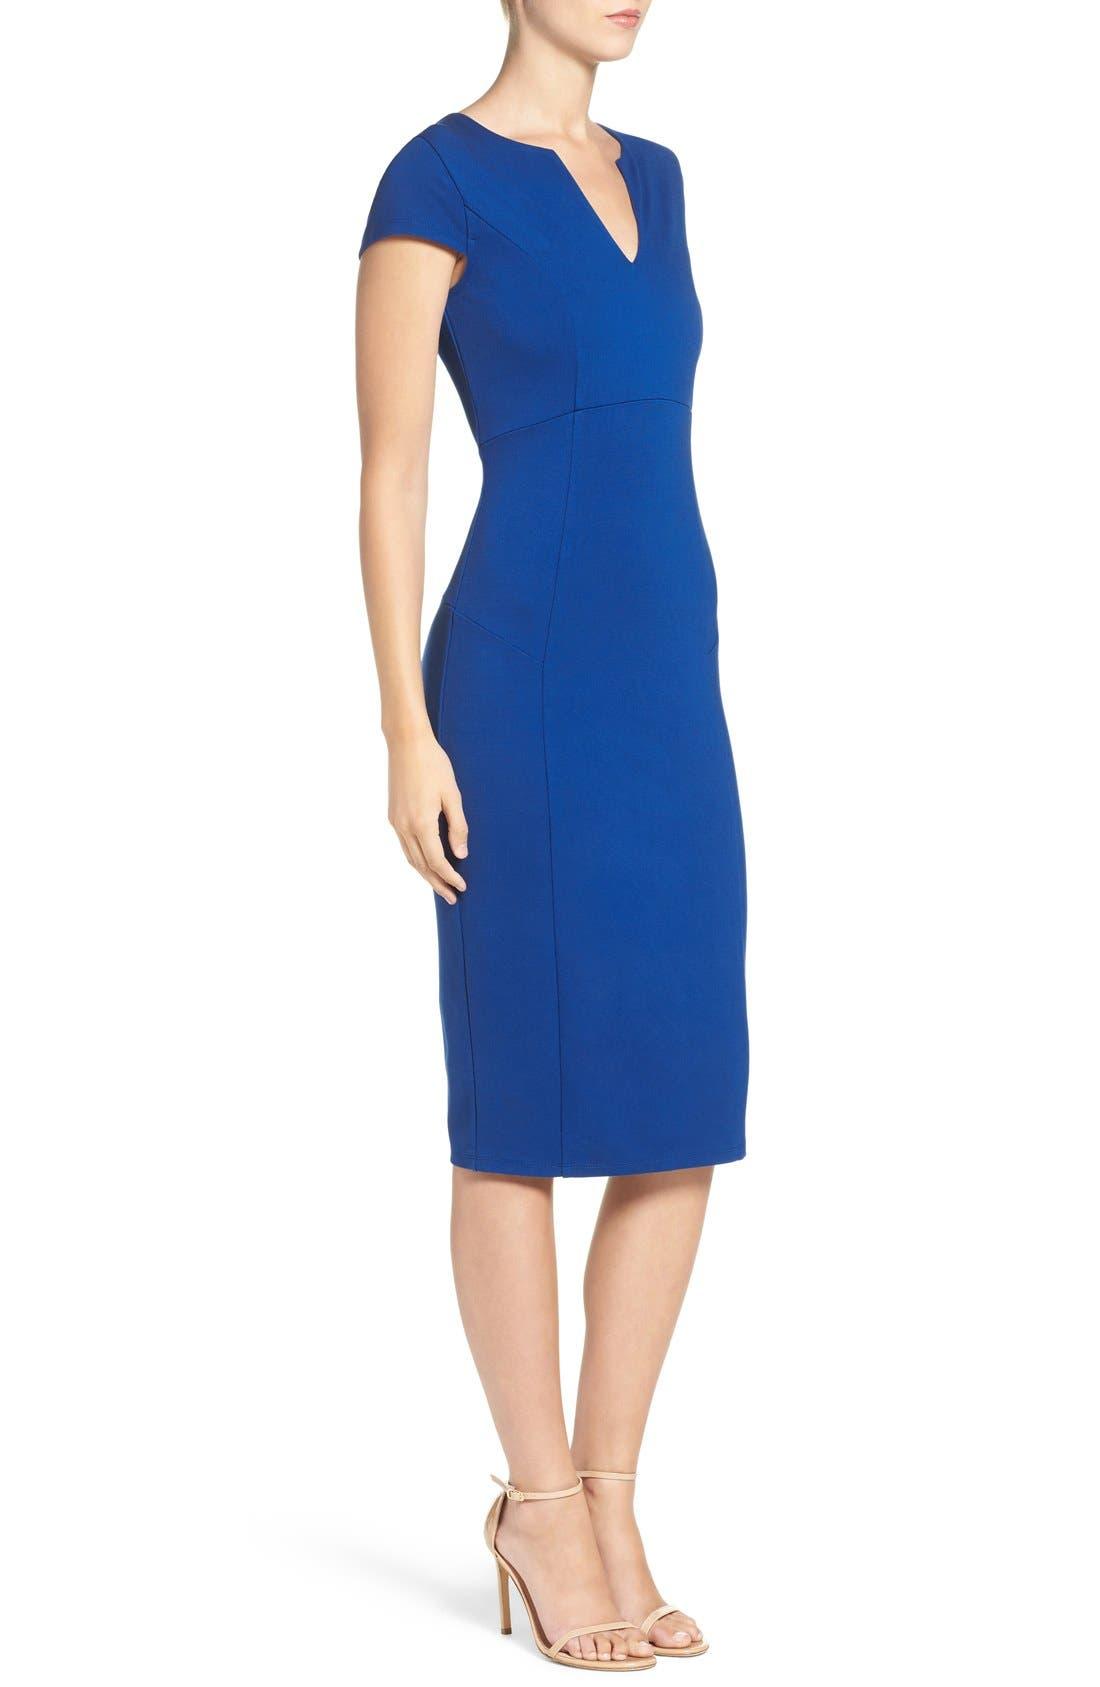 Alternate Image 3  - Felicity & Coco V-Neck Ponte Knit Midi Sheath Dress (Regular & Petite) (Nordstrom Exclusive)